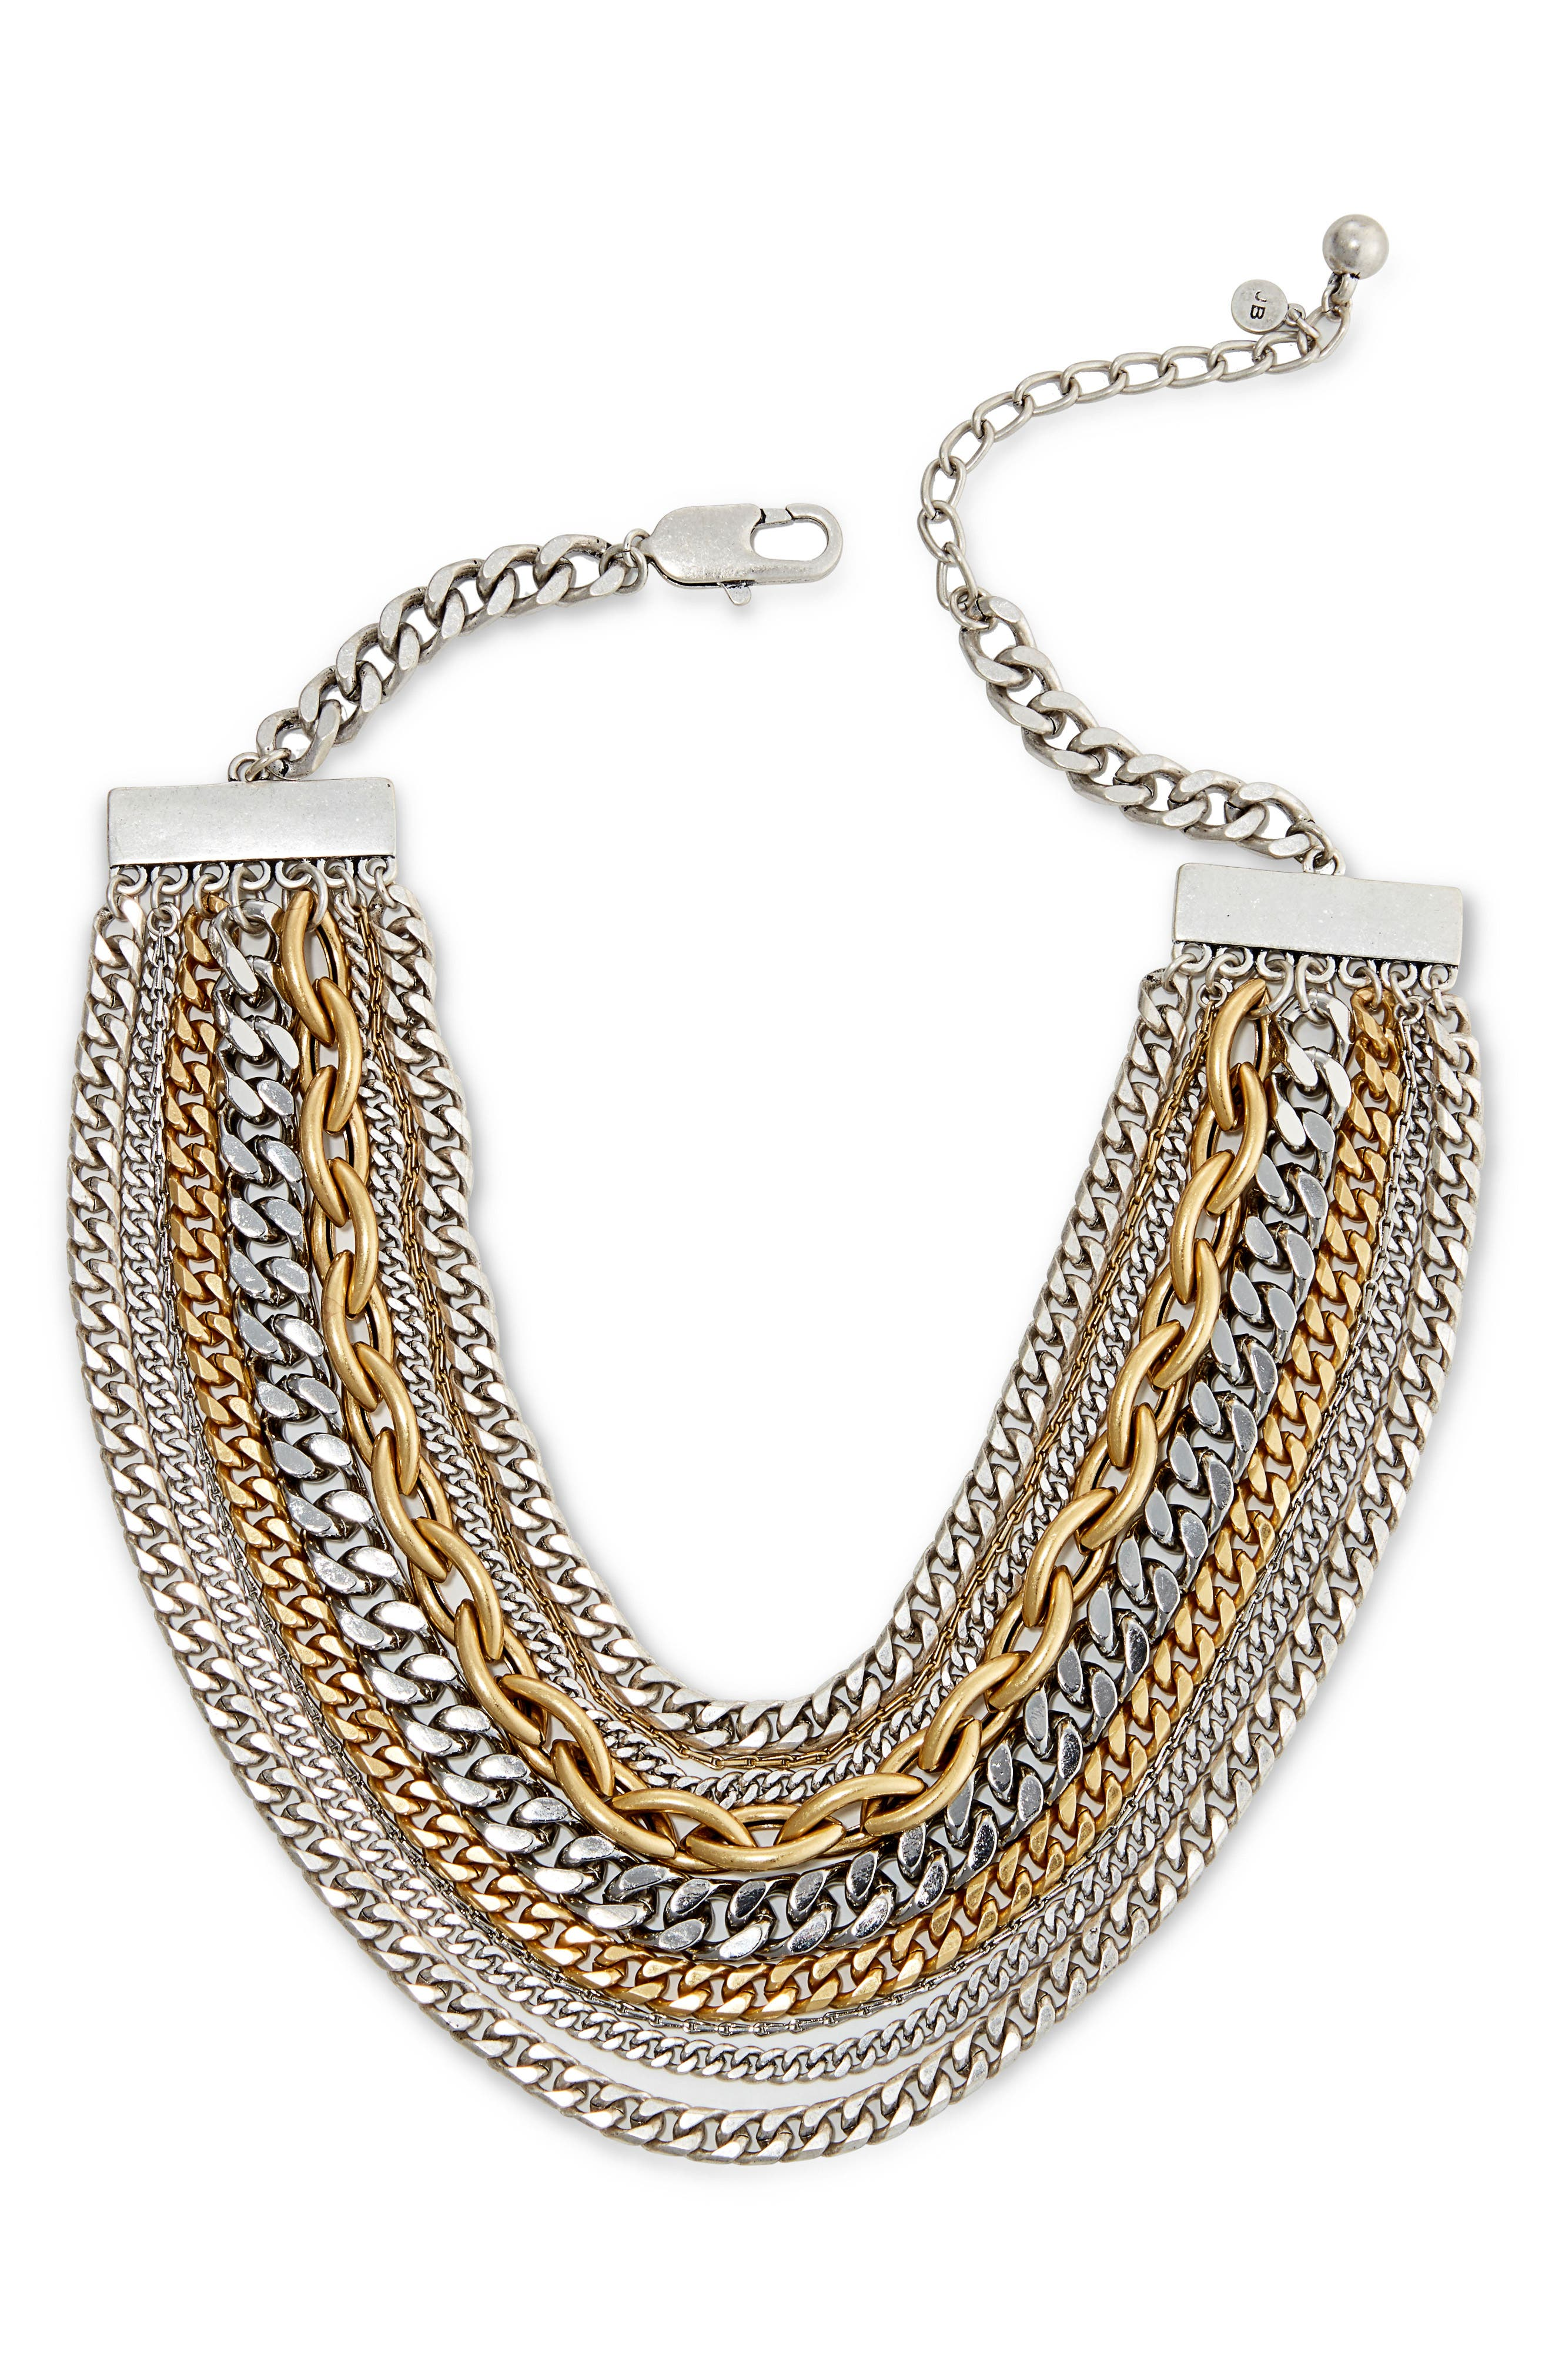 Marra Collar Necklace,                             Alternate thumbnail 3, color,                             Silver Multi